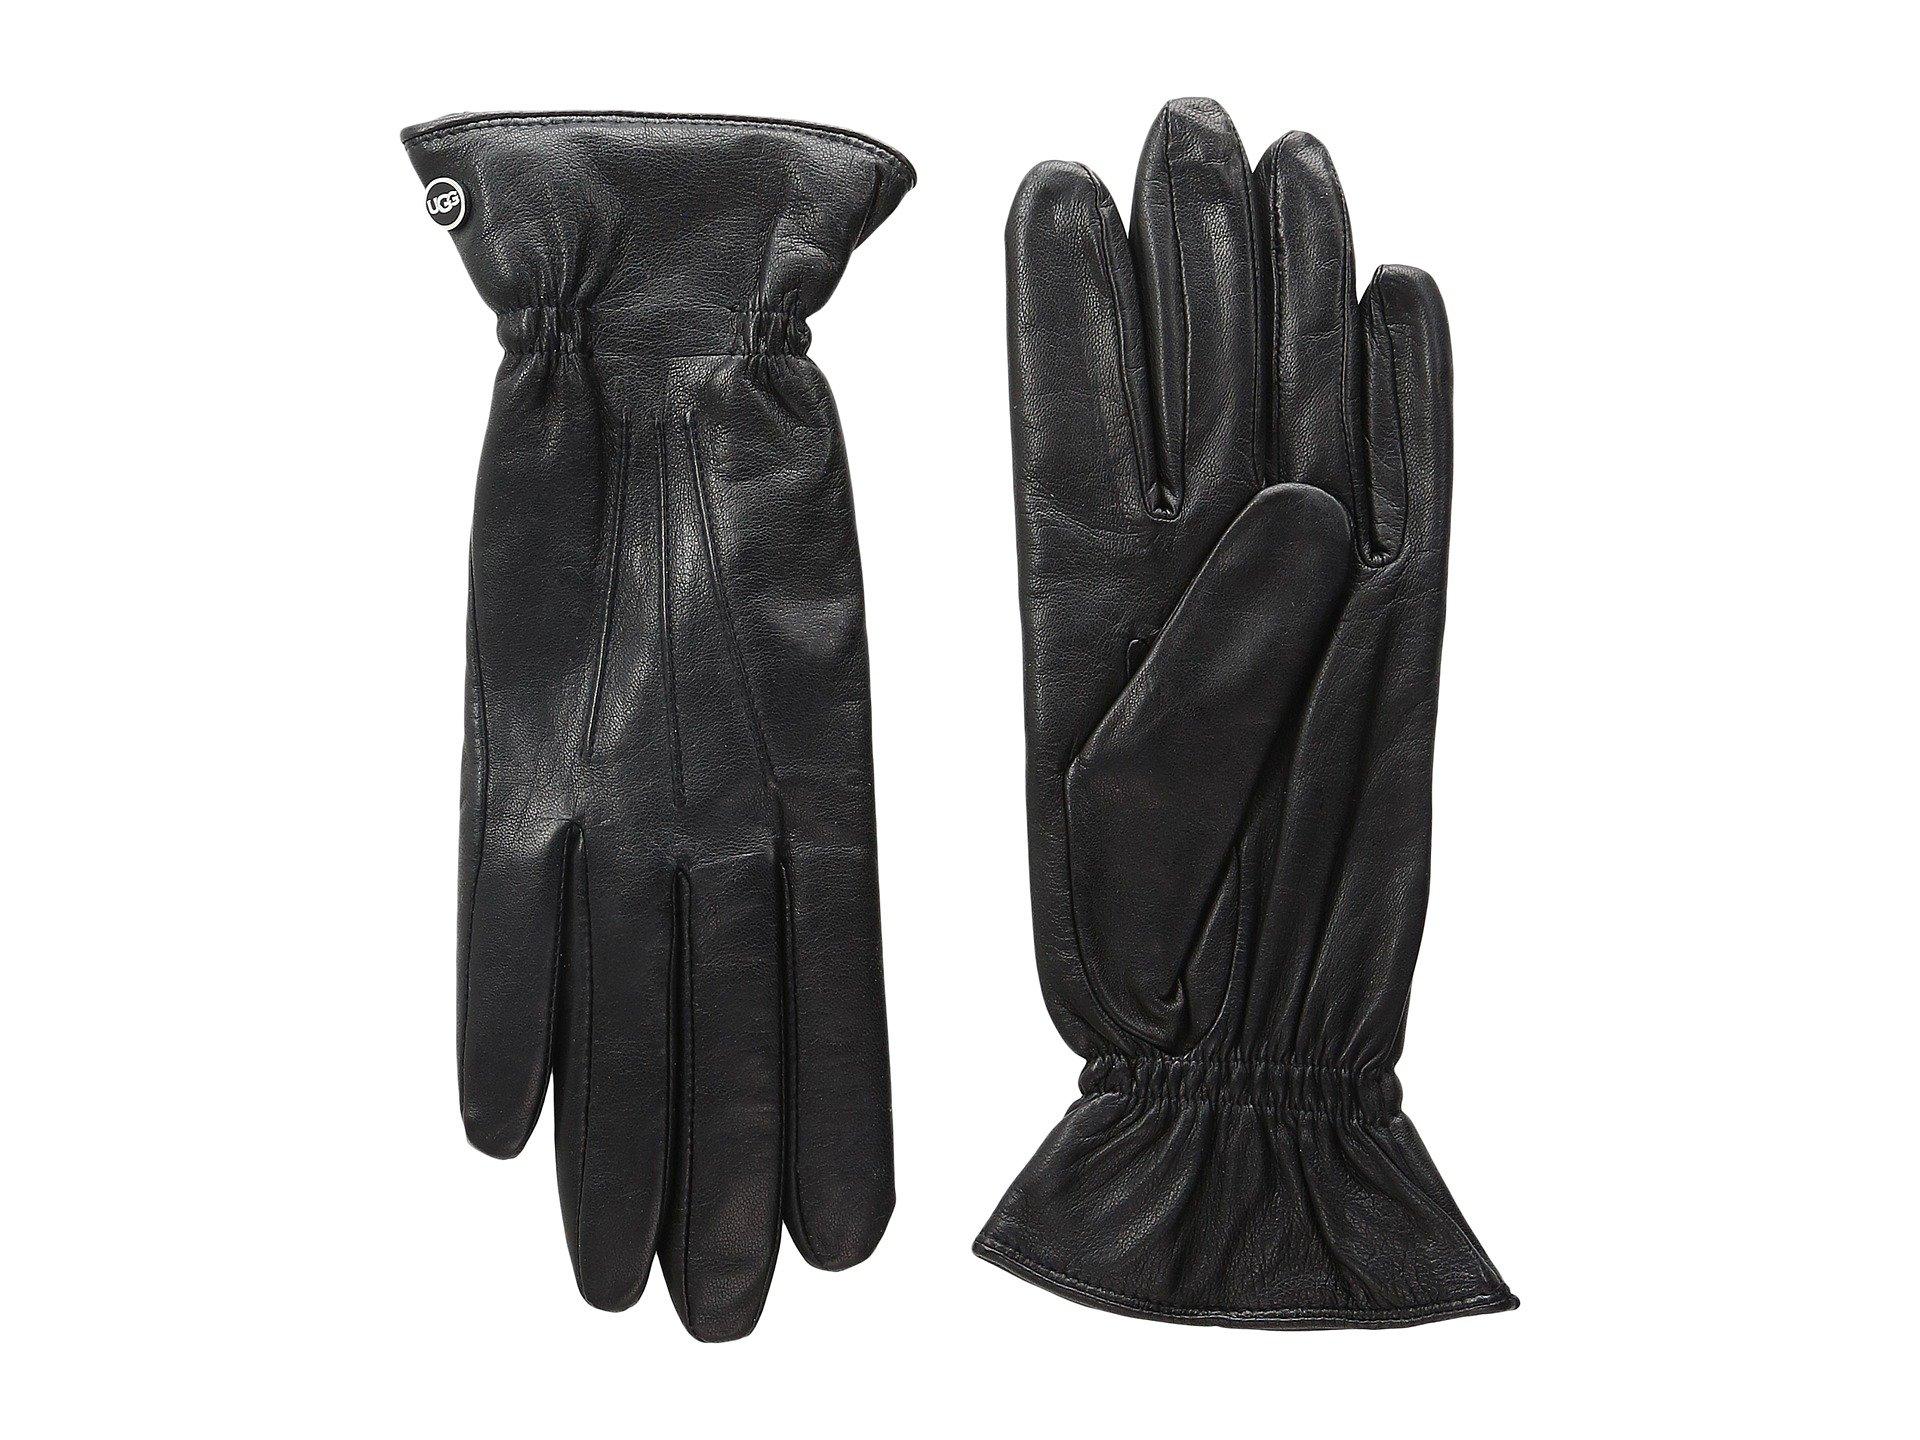 Guantes para Mujer UGG Joey Two Tone Glove  + UGG en VeoyCompro.net